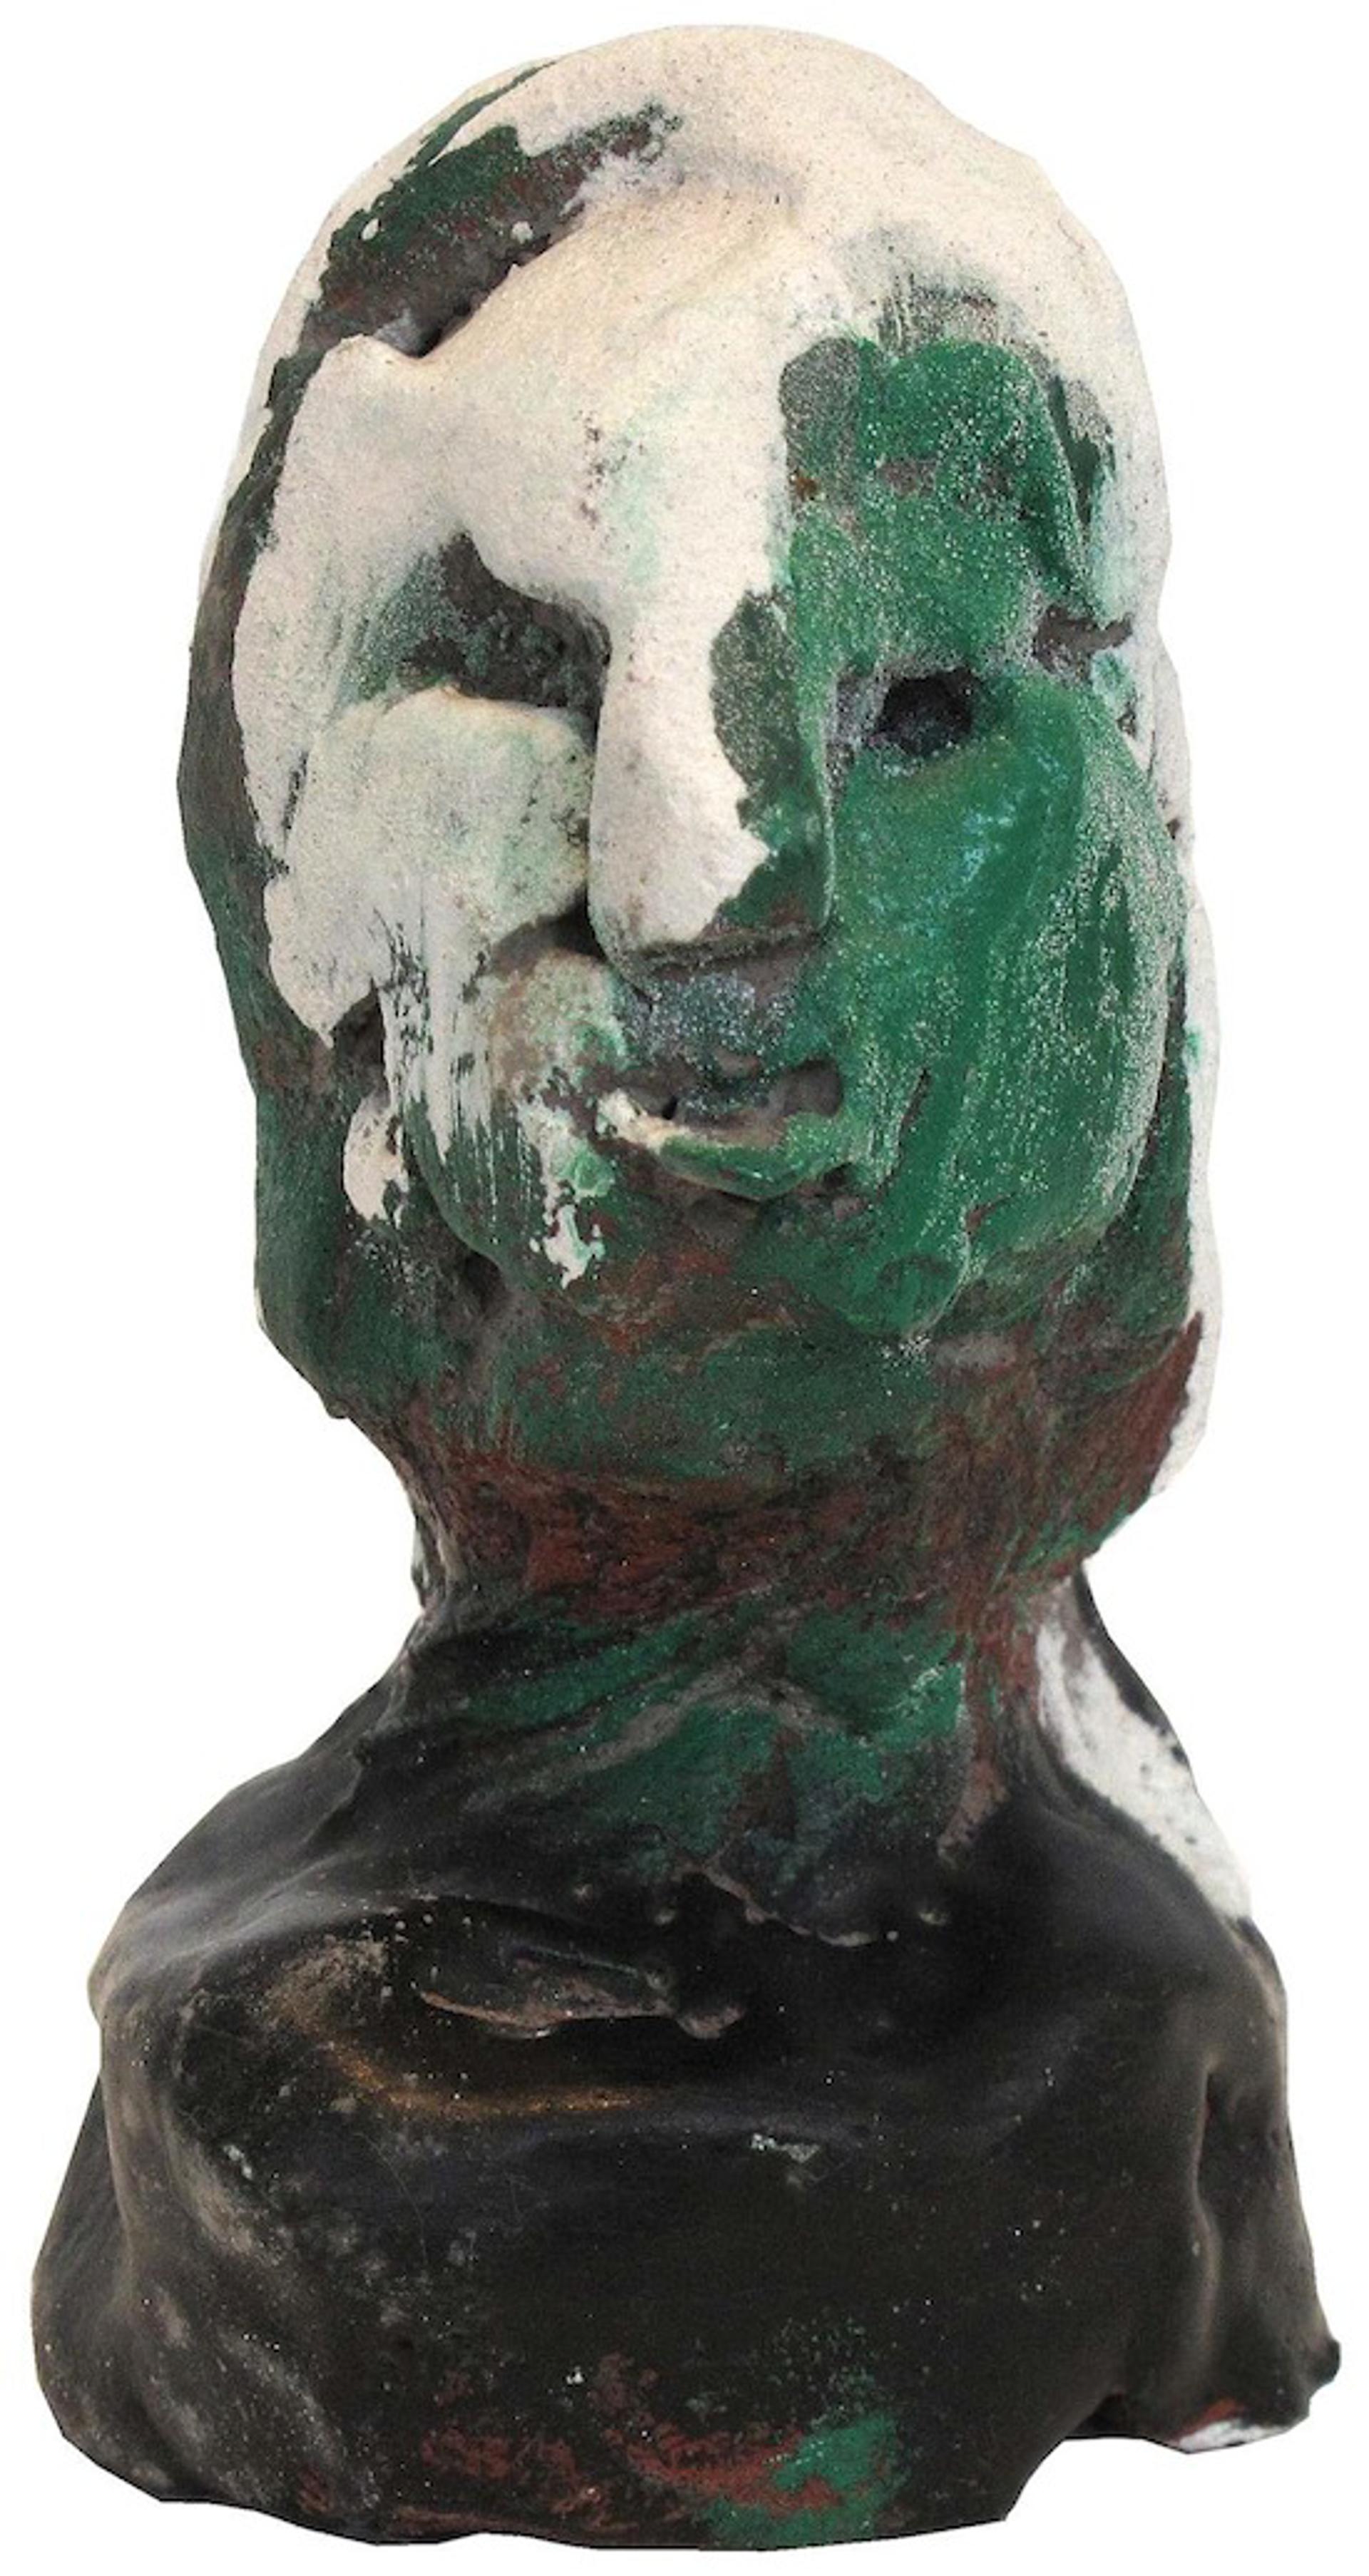 Green Face White Hair by James Havard